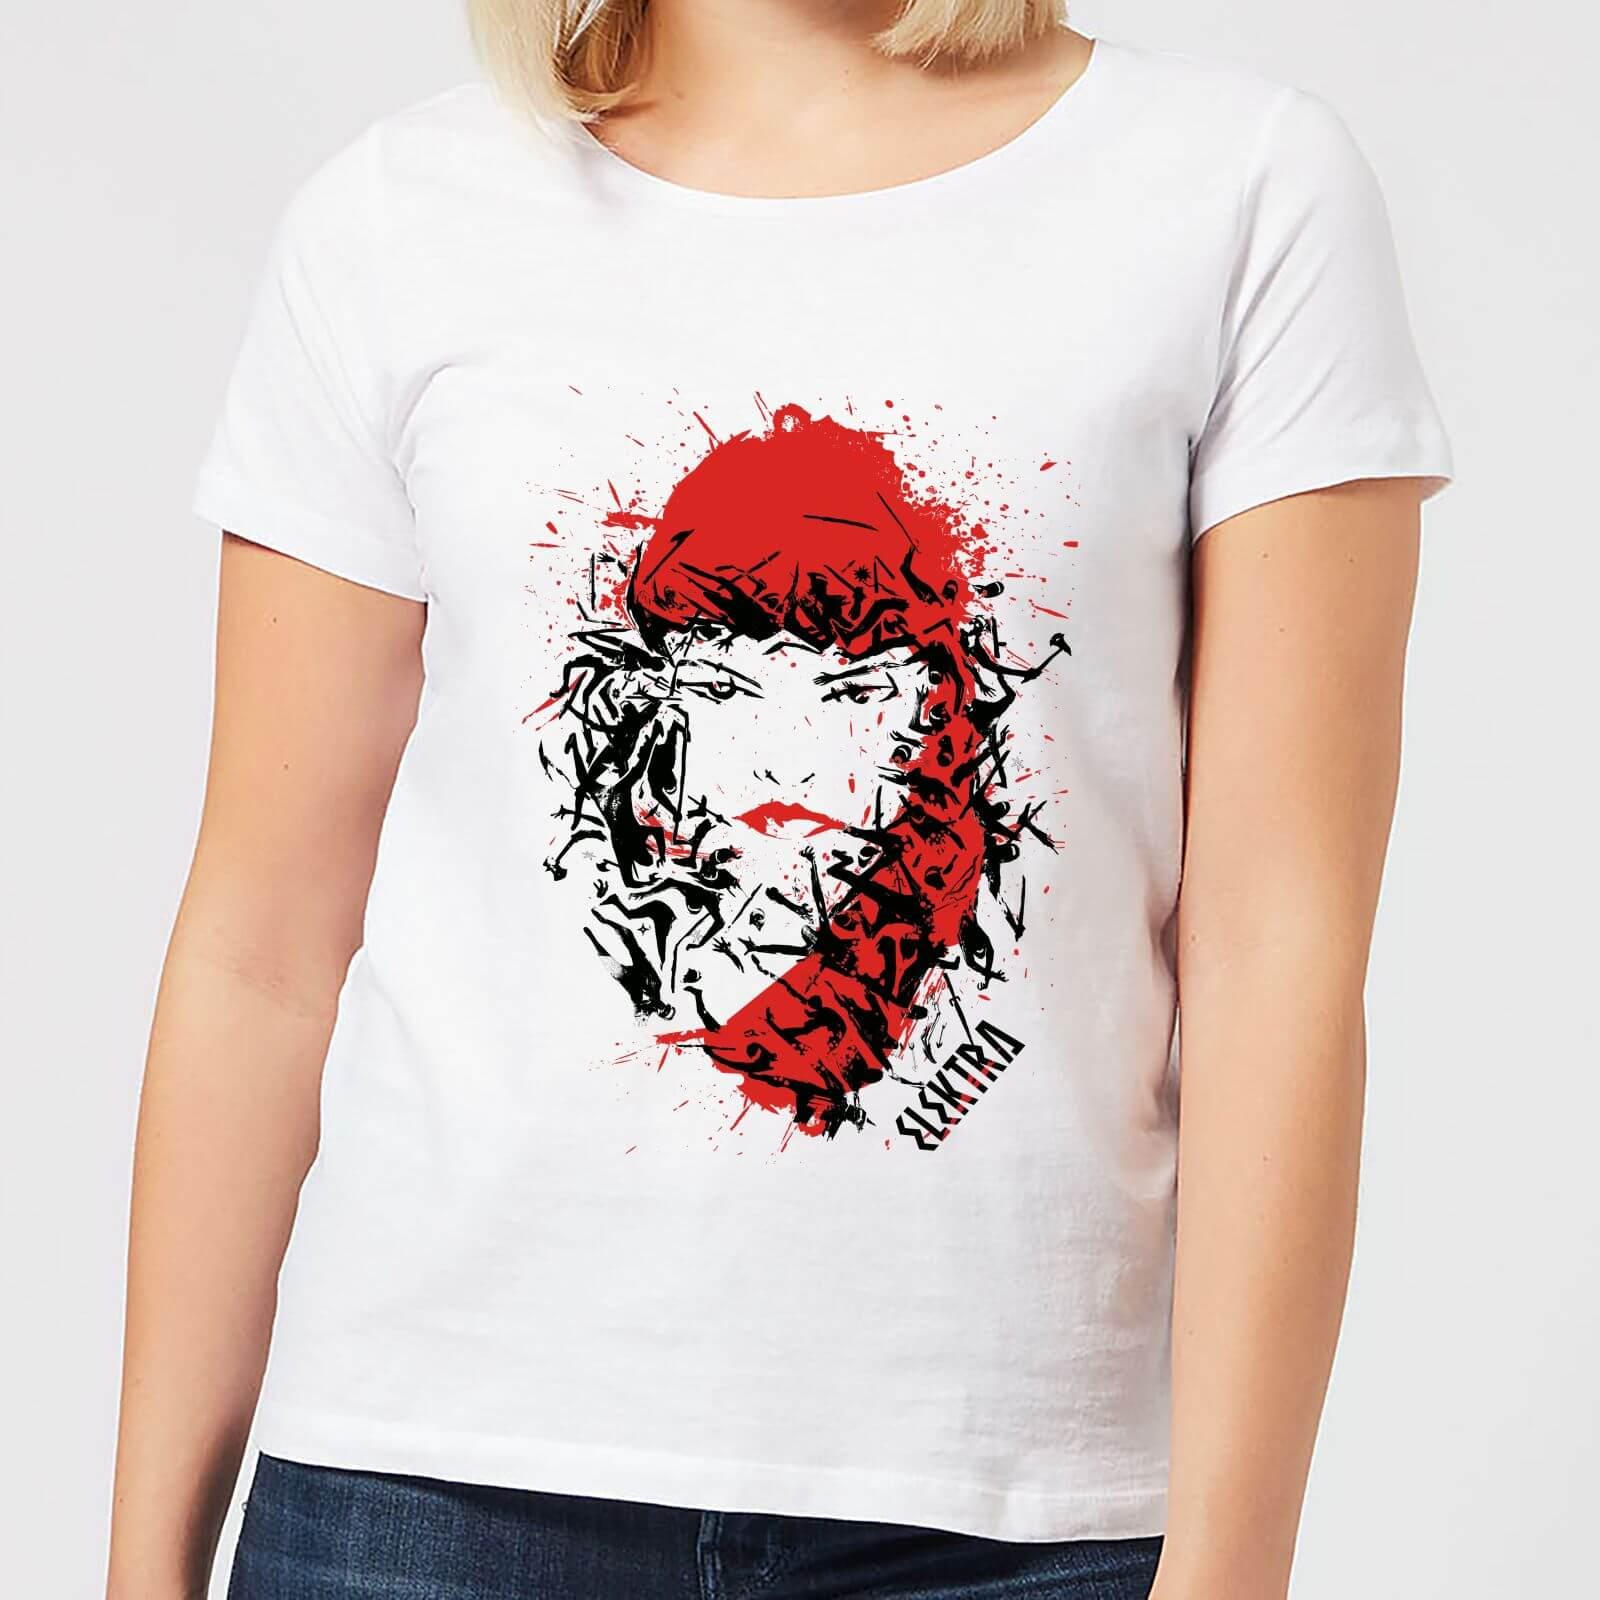 OfferteWeb.click 49-t-shirt-marvel-knights-elektra-face-of-death-bianco